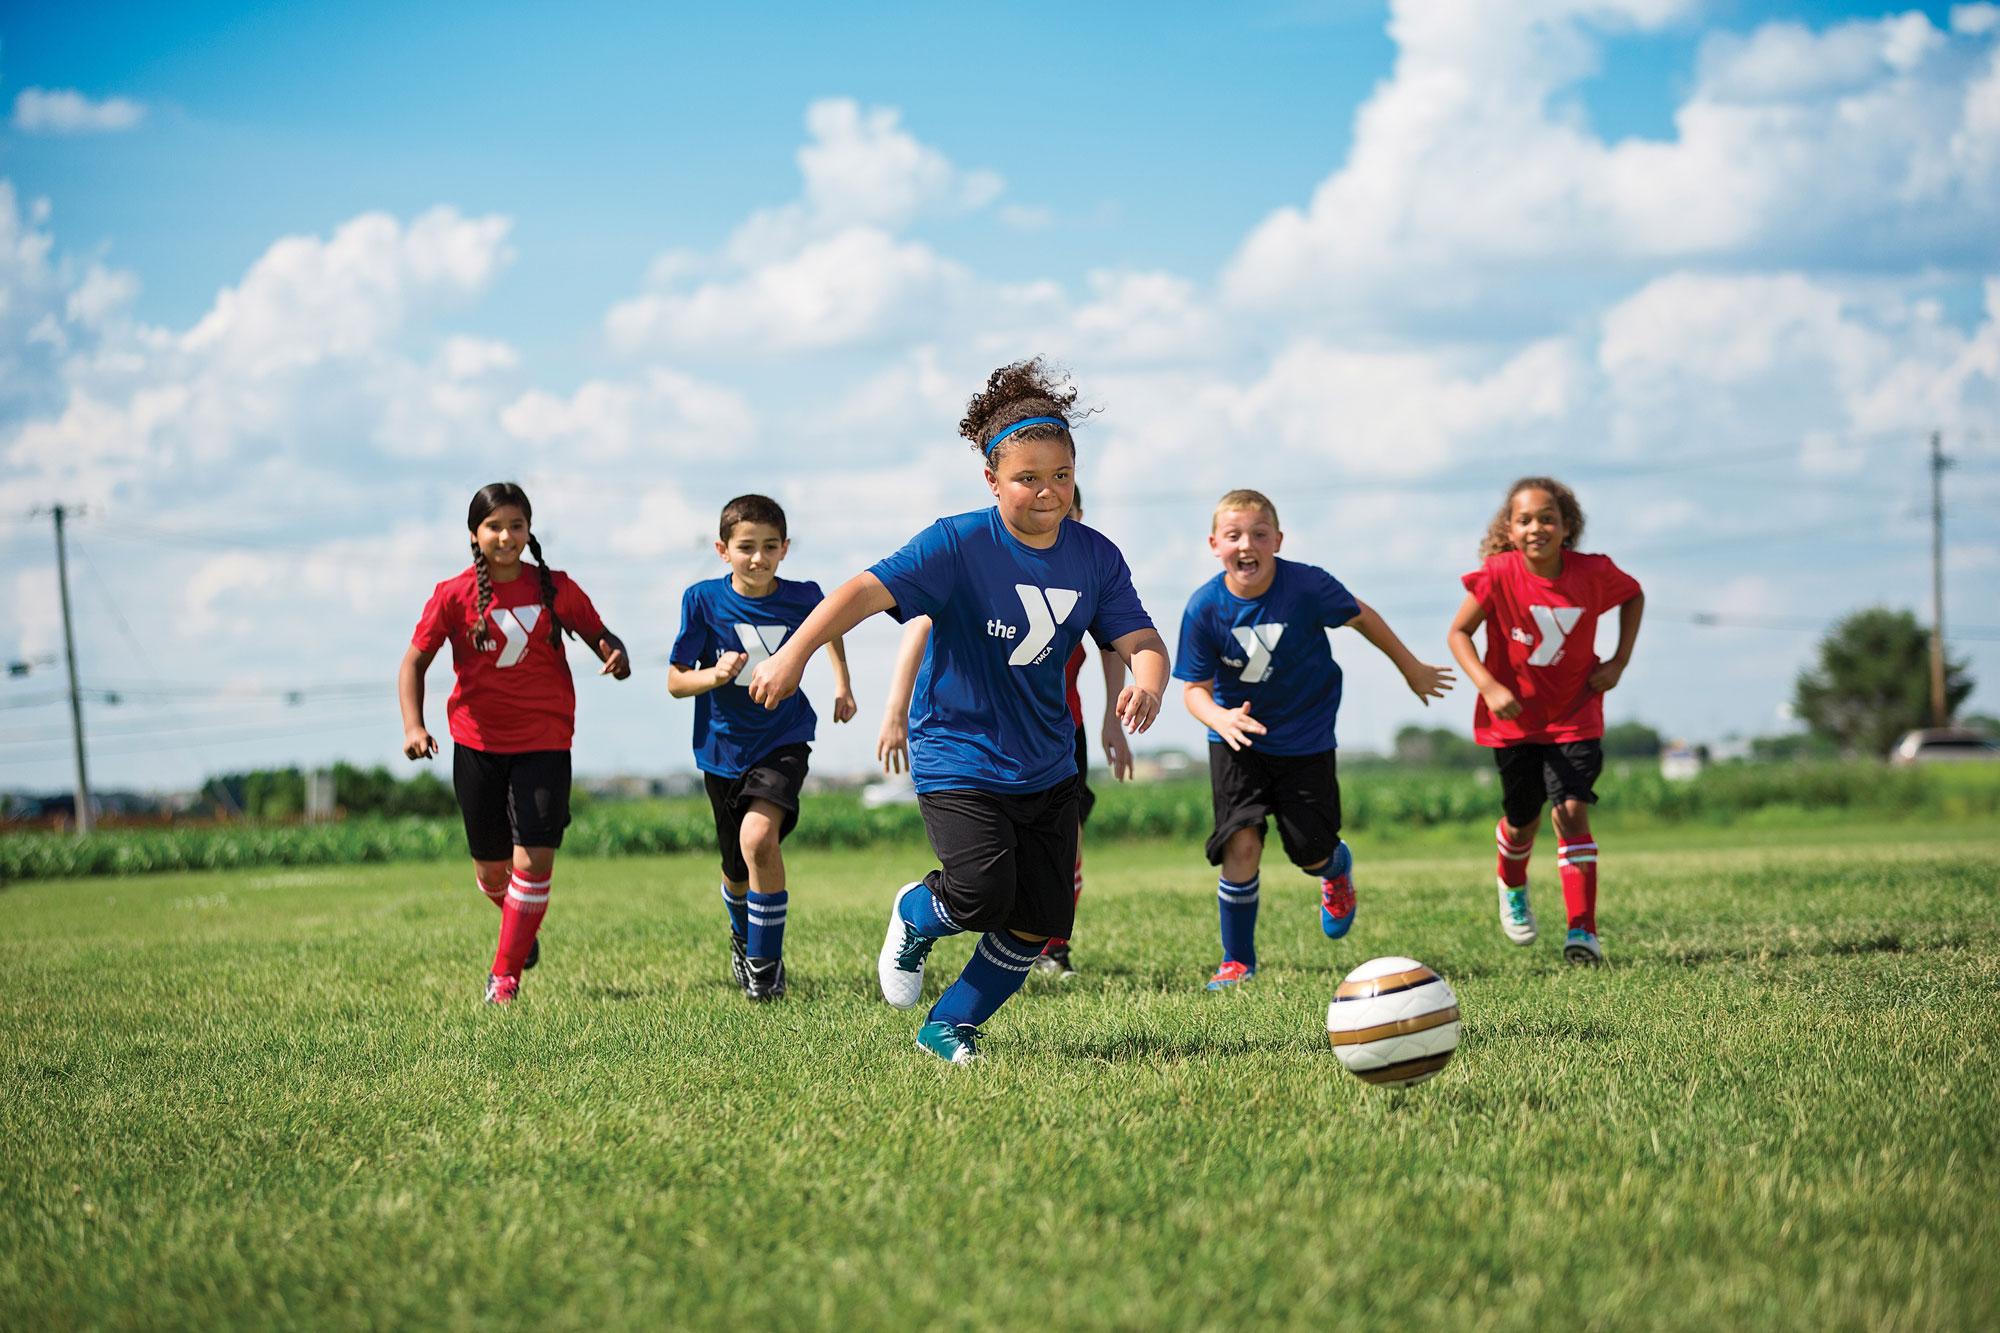 Soccer | YMCA OF GREATER WICHITA